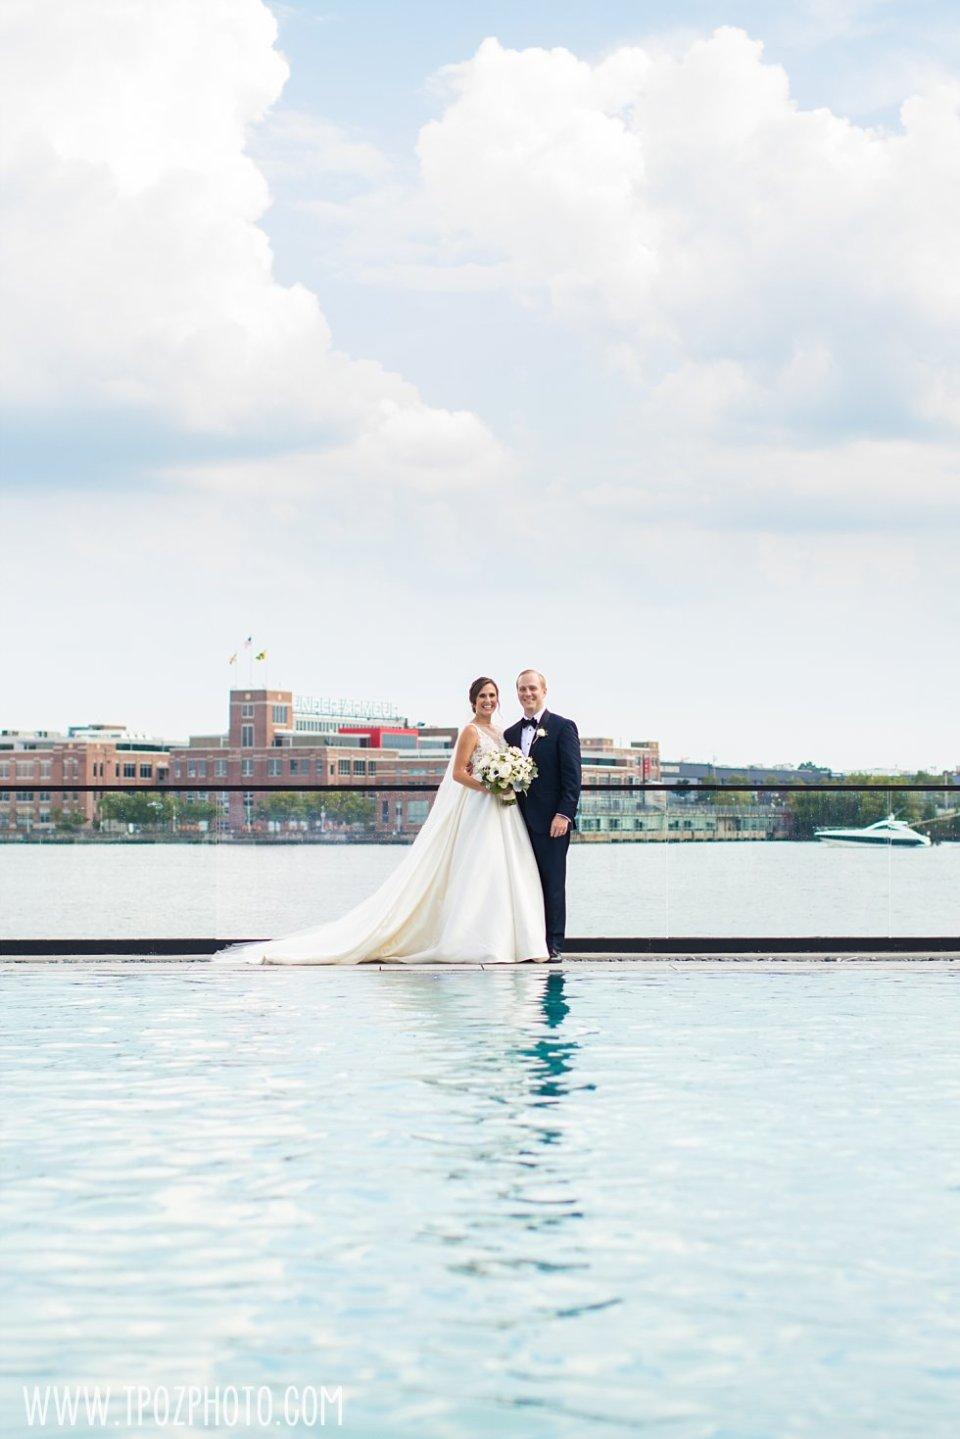 Sagamore Pendry Pool wedding photos bride & groom • tPoz Photography • www.tpozphoto.com